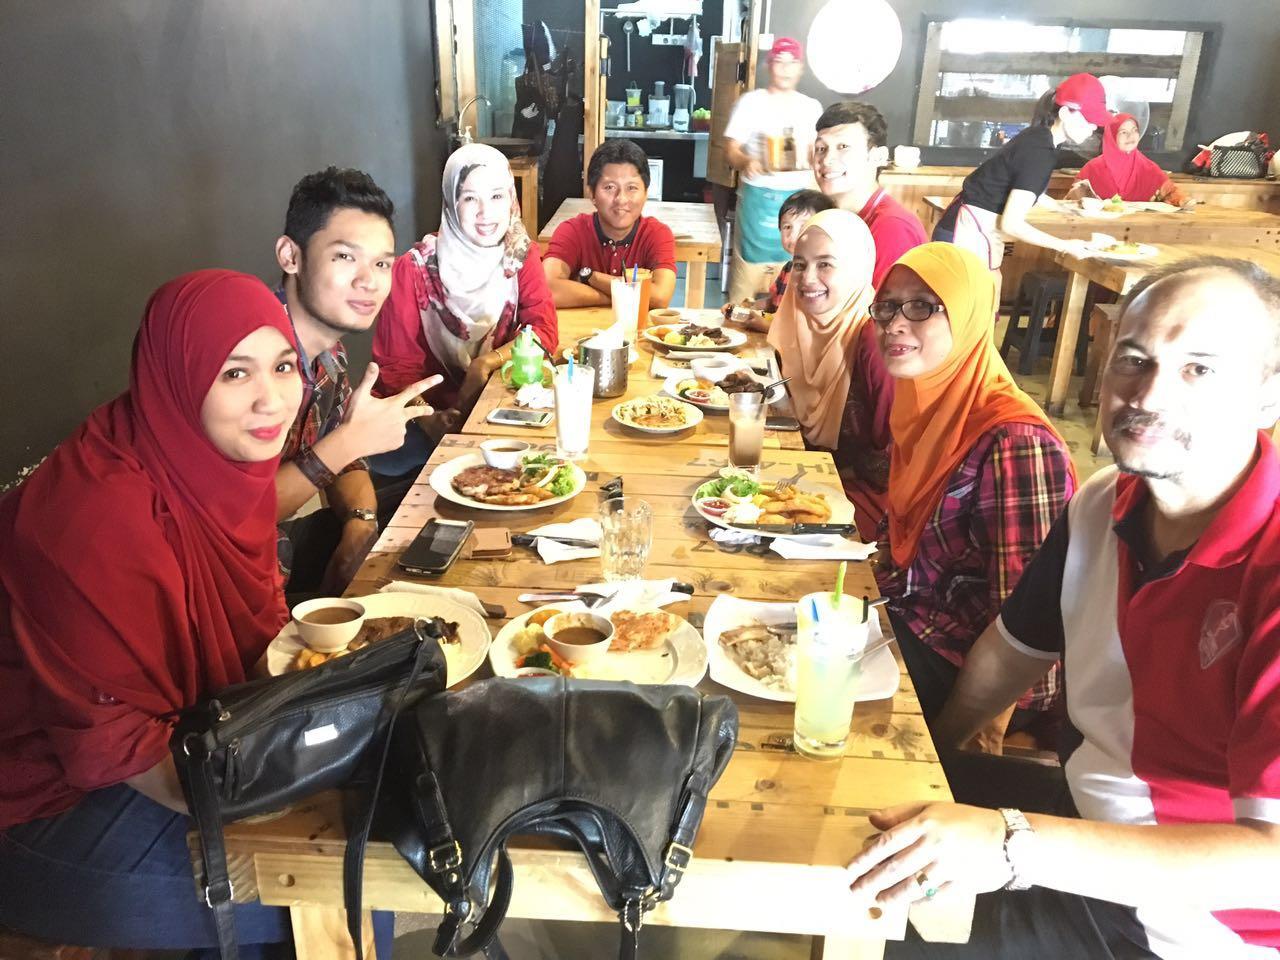 Uncle Sam Kitchen - Shah Alam, Selangor